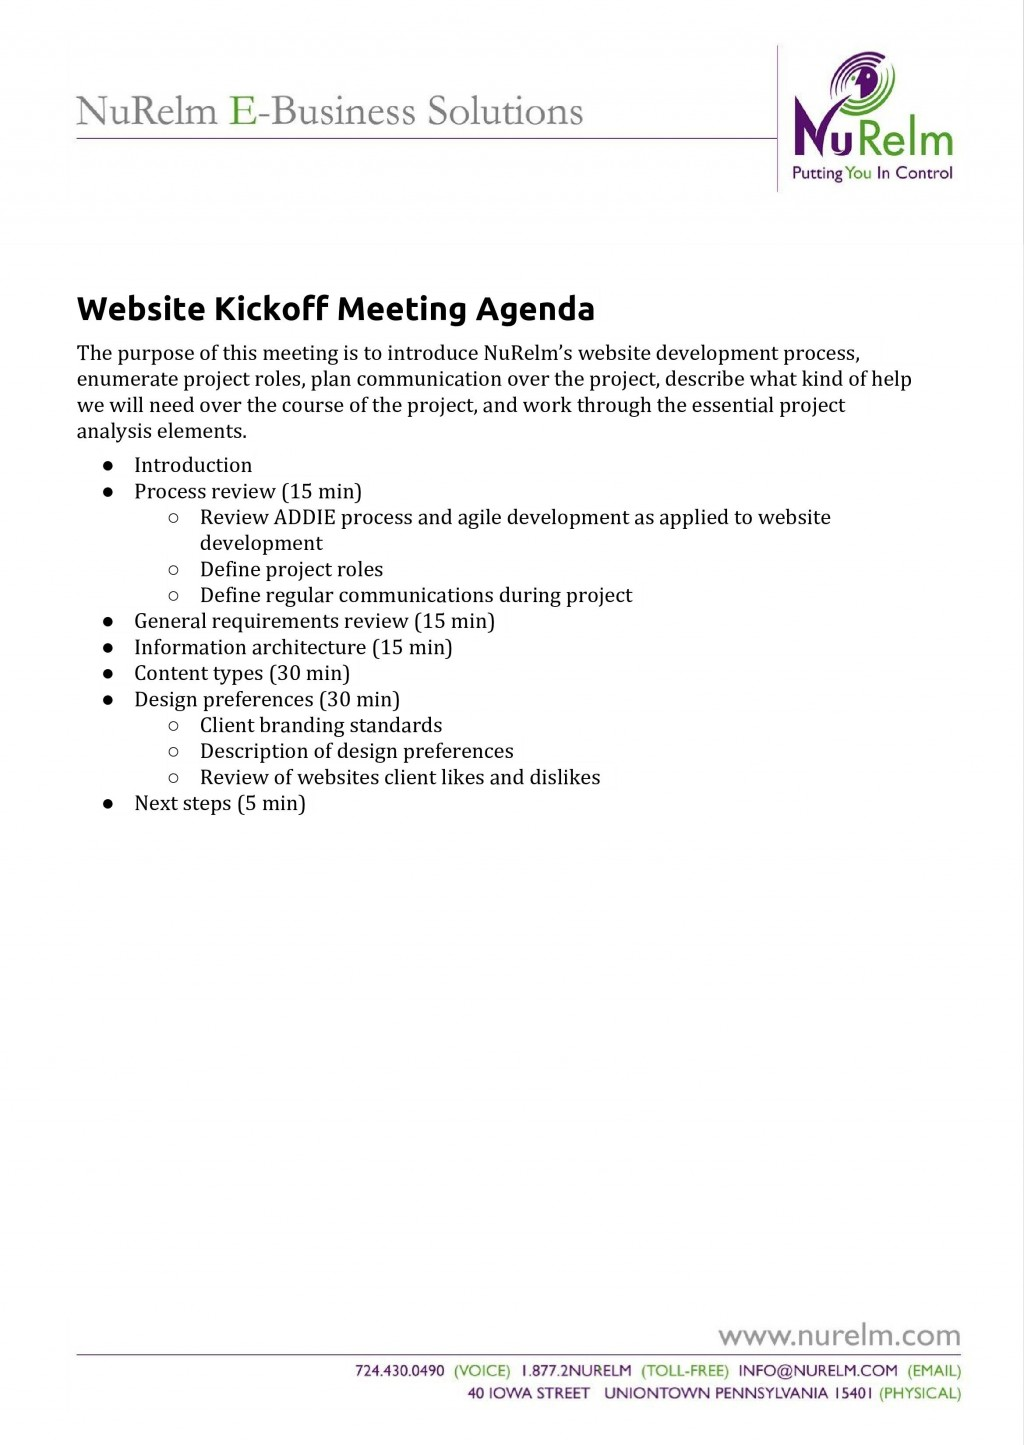 003 Singular Kick Off Meeting Template Concept  Invitation Email Agenda Project ManagementLarge